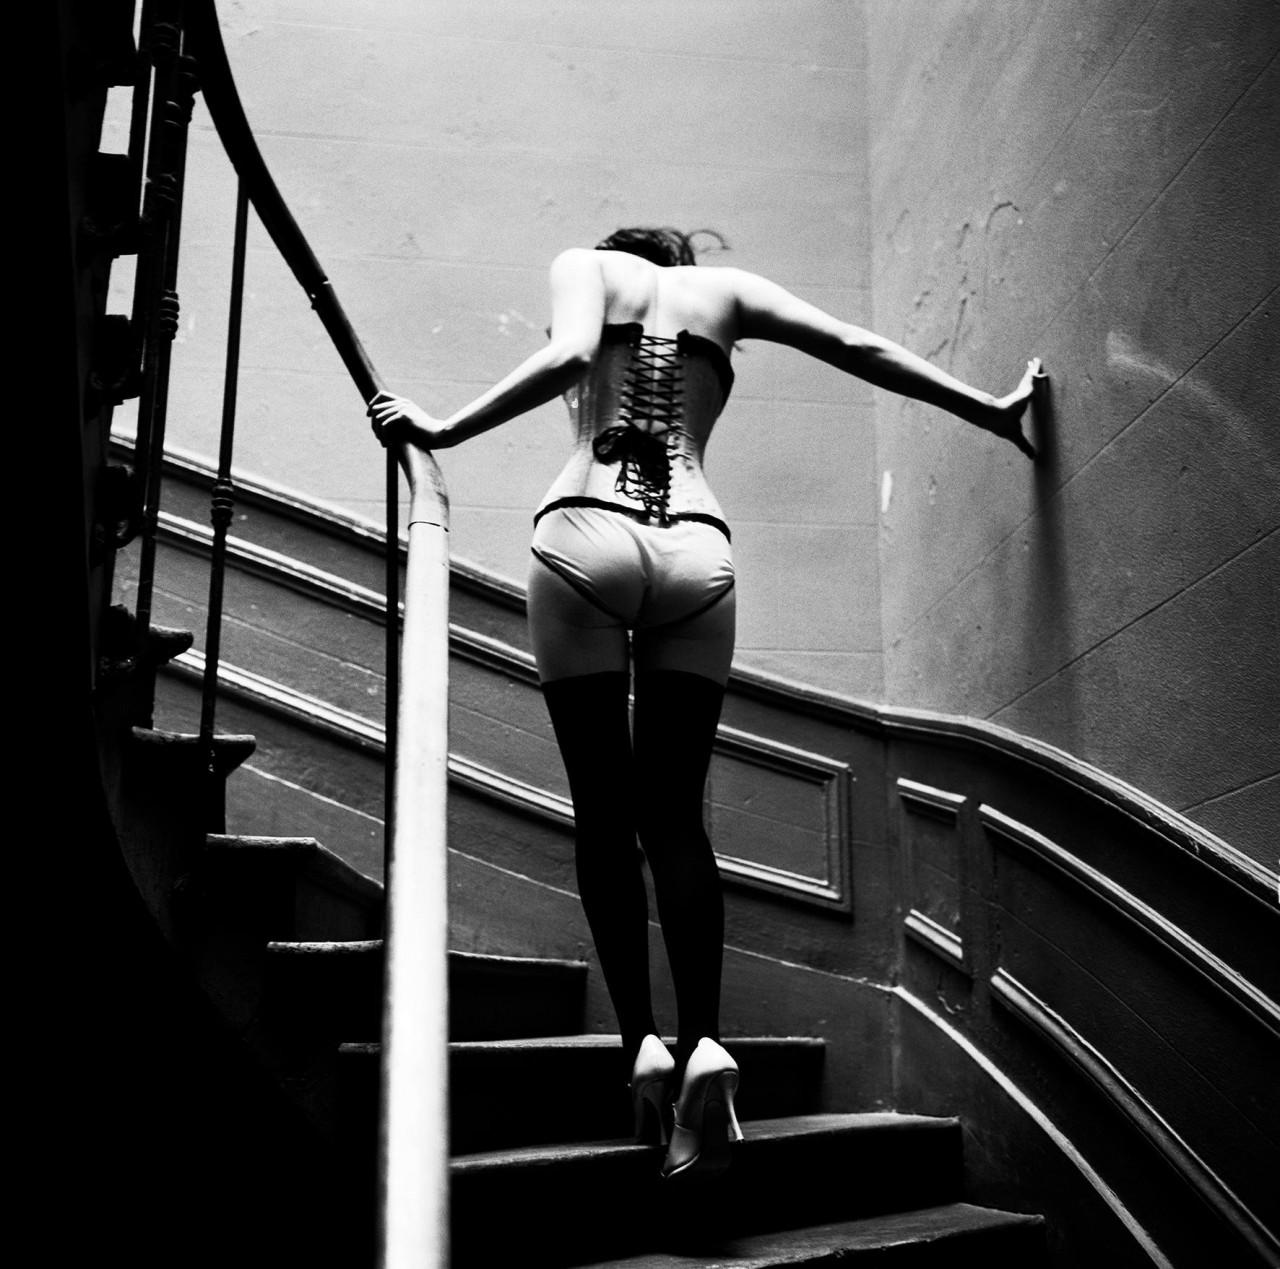 Подъём по лестнице, Париж, 2003. Фотограф Эллен фон Унверт